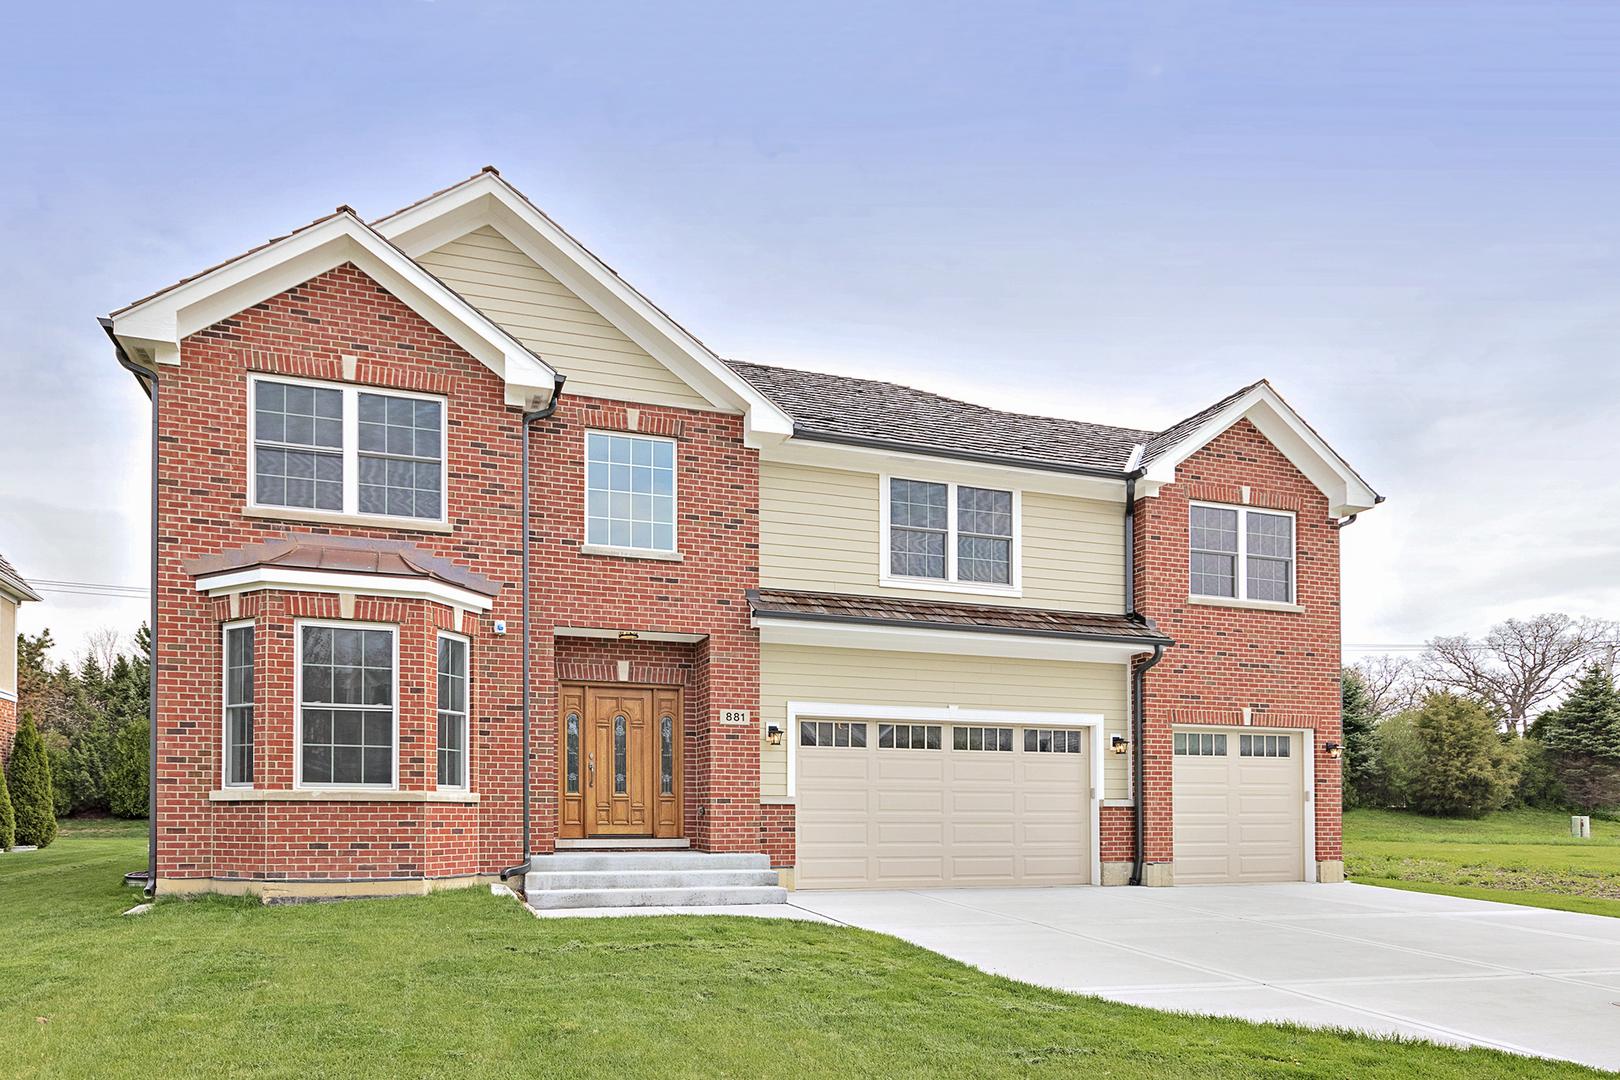 881 East Writer Court Vernon Hills, IL 60061